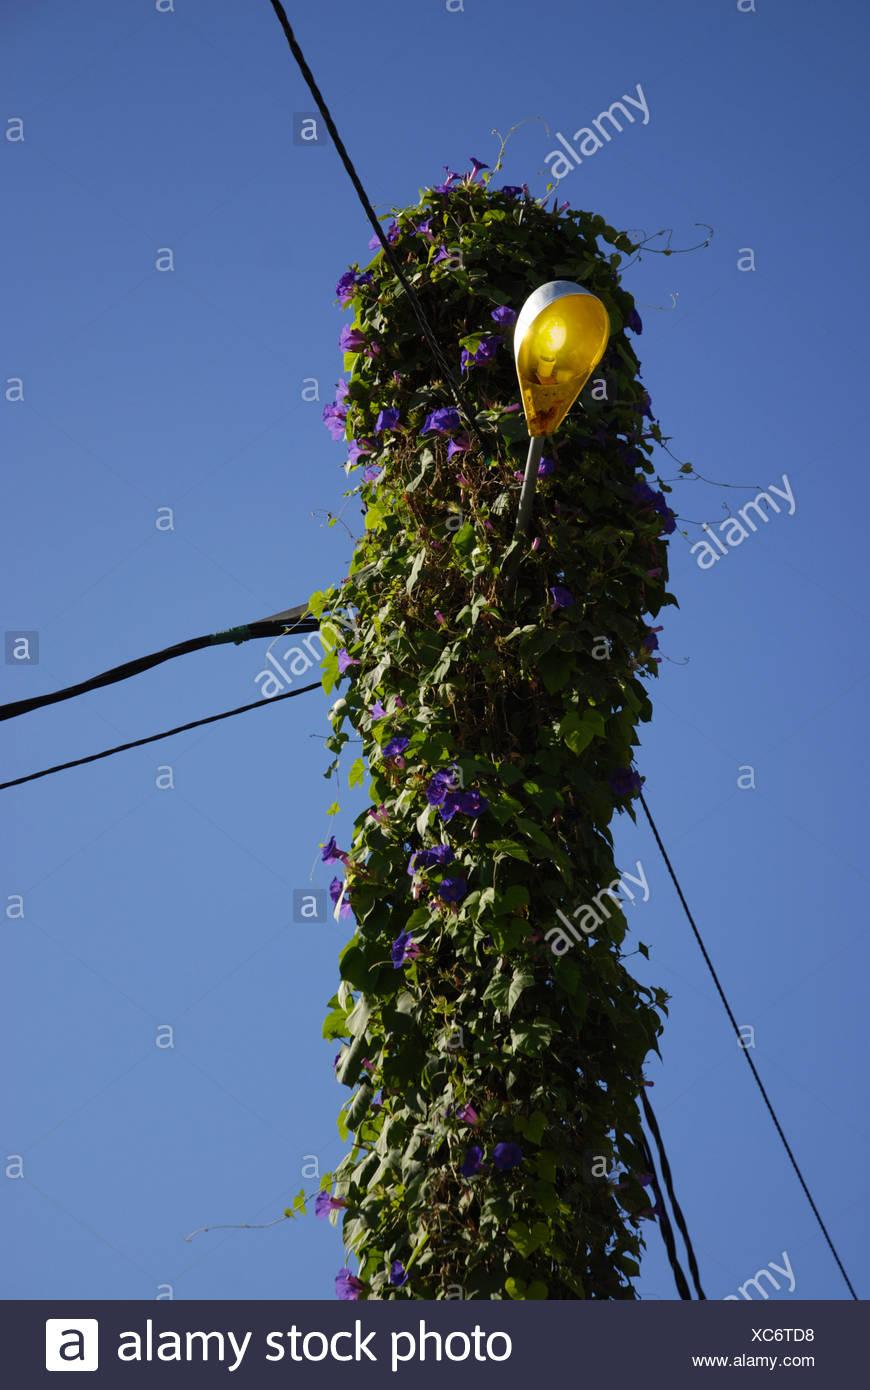 The spanish way of light masts, Port de Soller, Majorca, Spain - Stock Image